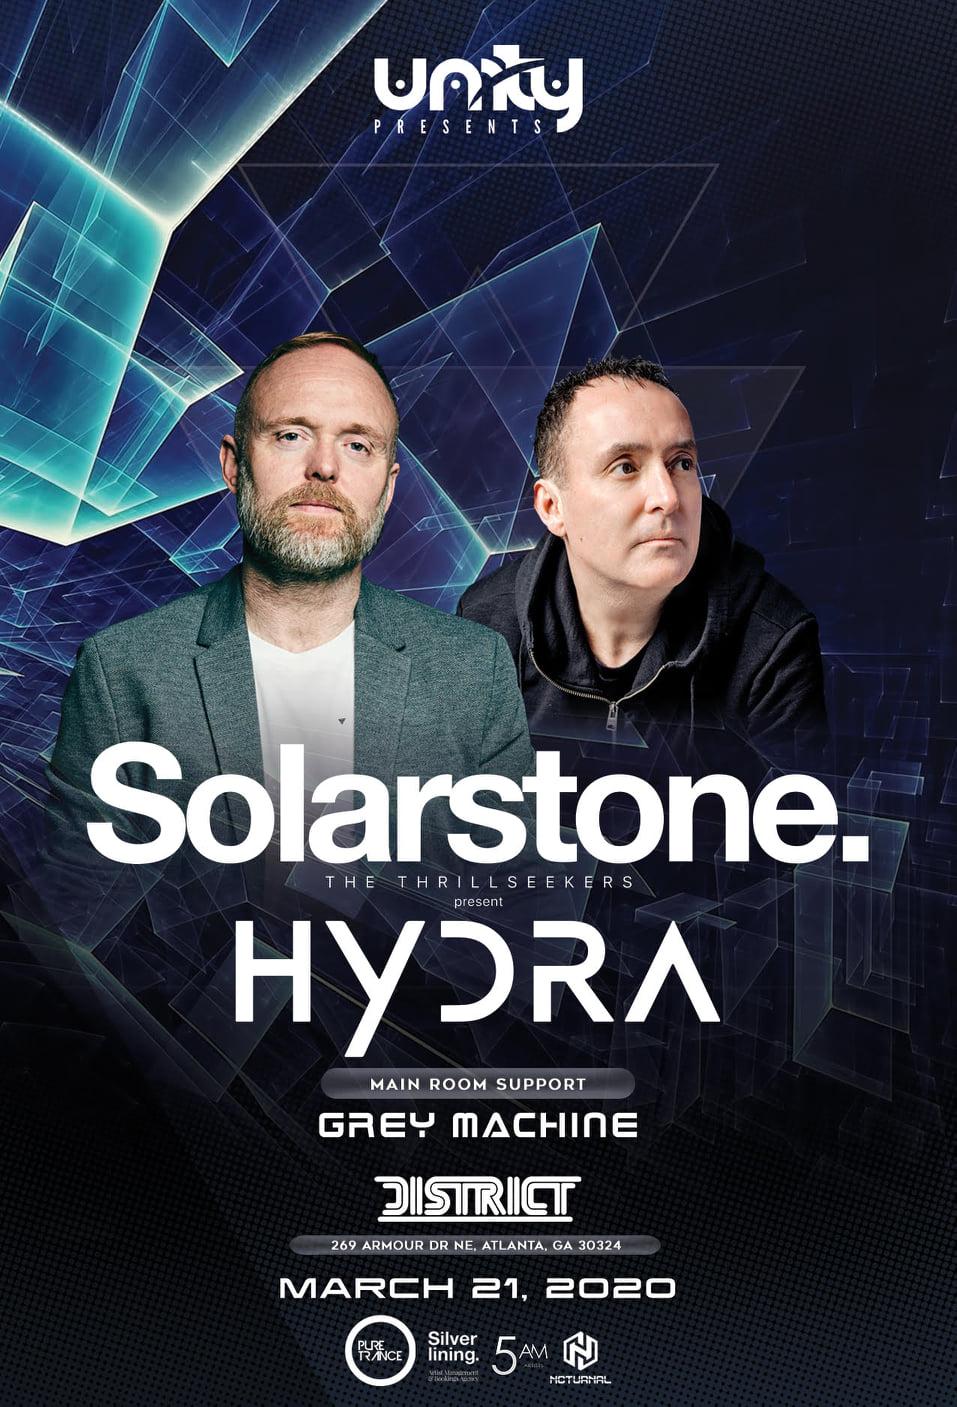 Solarstone & The Thrillseekers Present Hydra @ District Atlanta